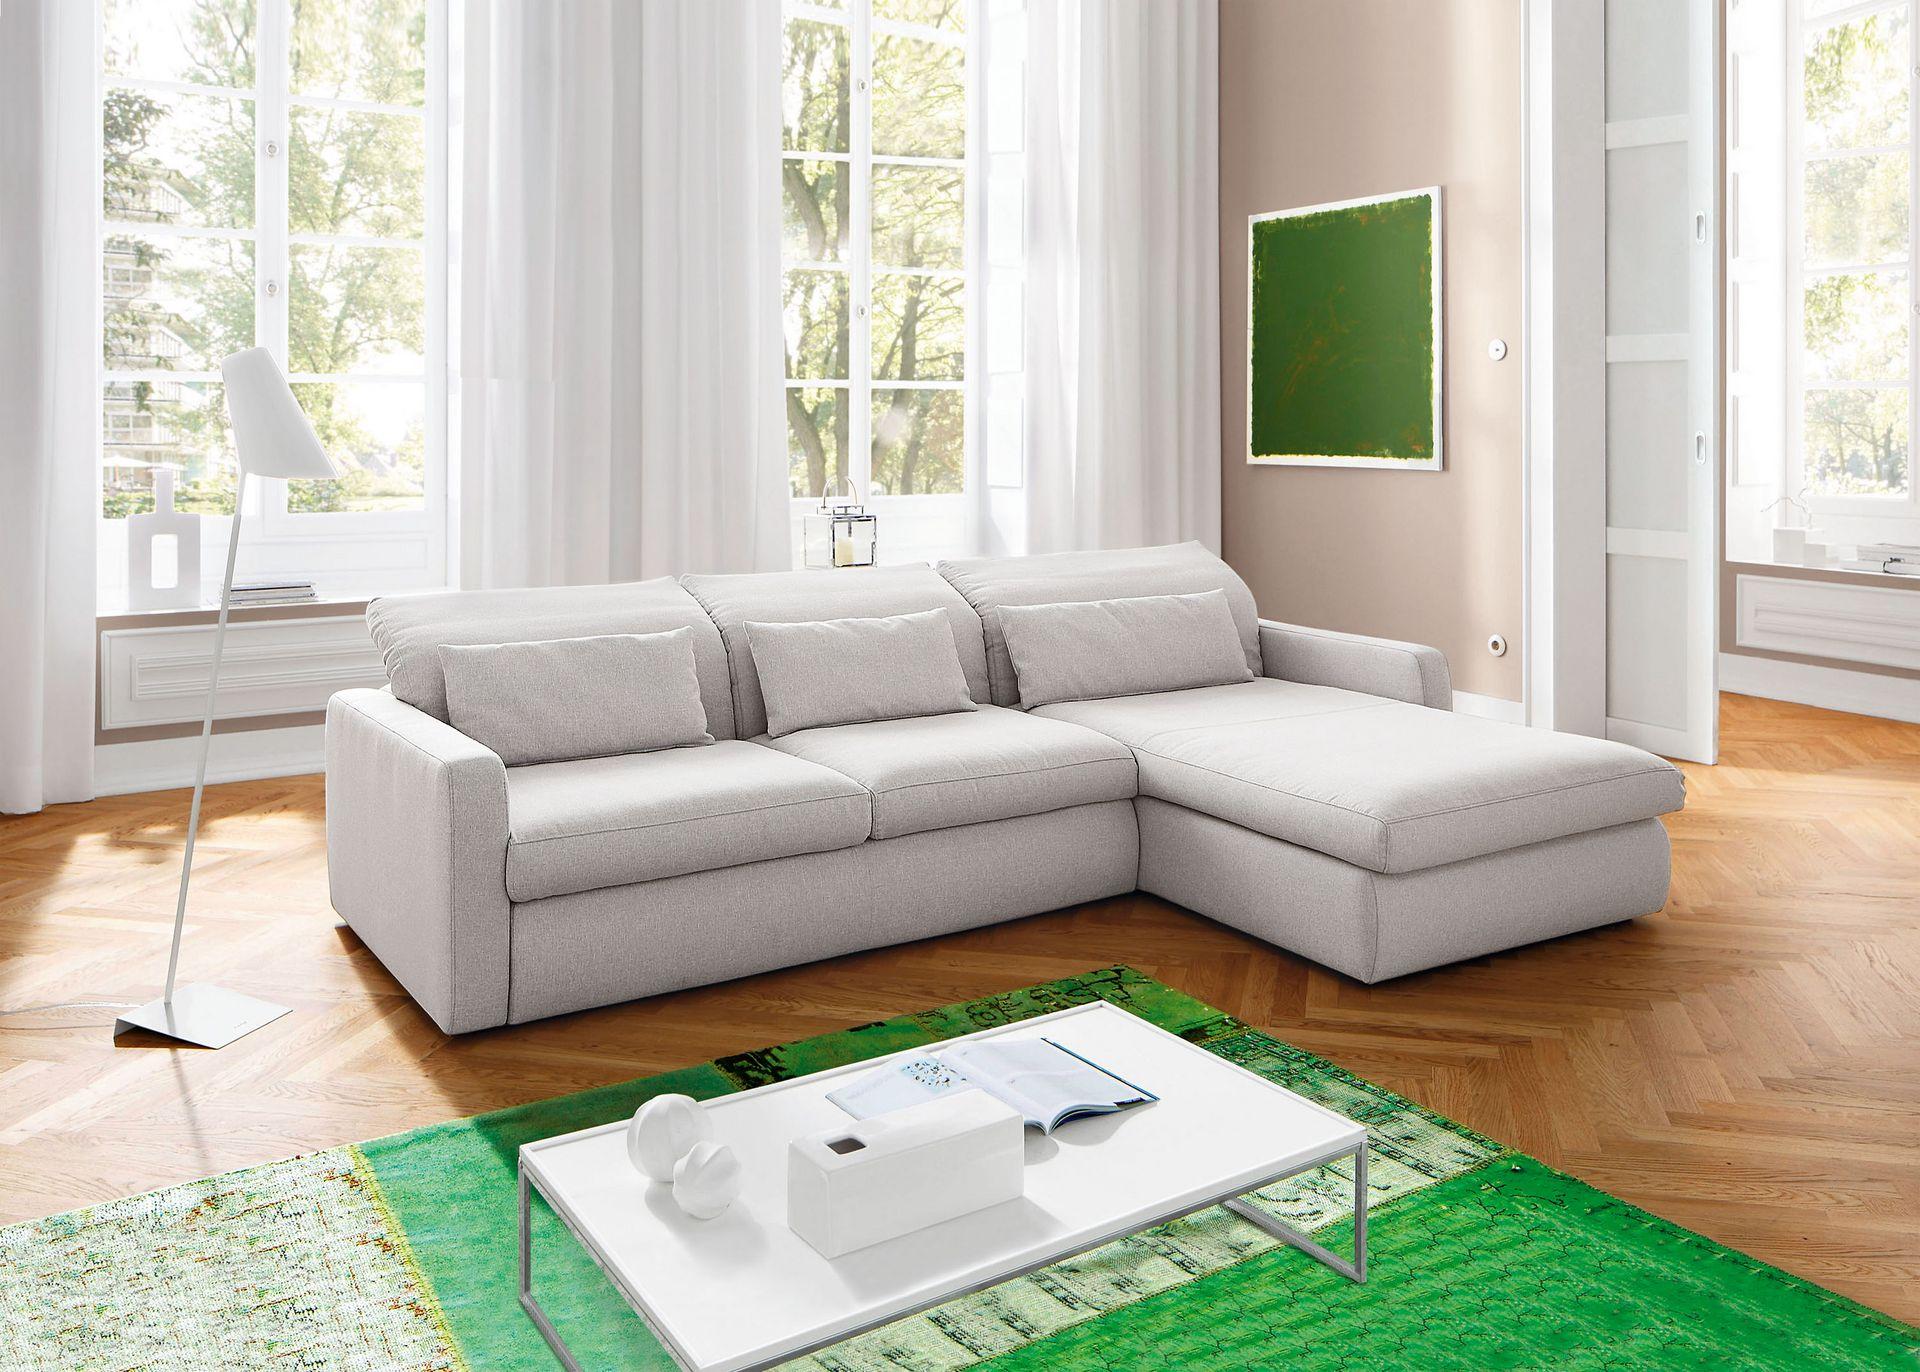 Full Size of Sofa Mondo 3 Agata Meble Kaufen Group Leder Srl 1 Couch Brick Online Erfahrungen Bertinoro Orari Softline Bed Capocolle 2 Eckkombination Barrow Light Grey Sofa Mondo Sofa